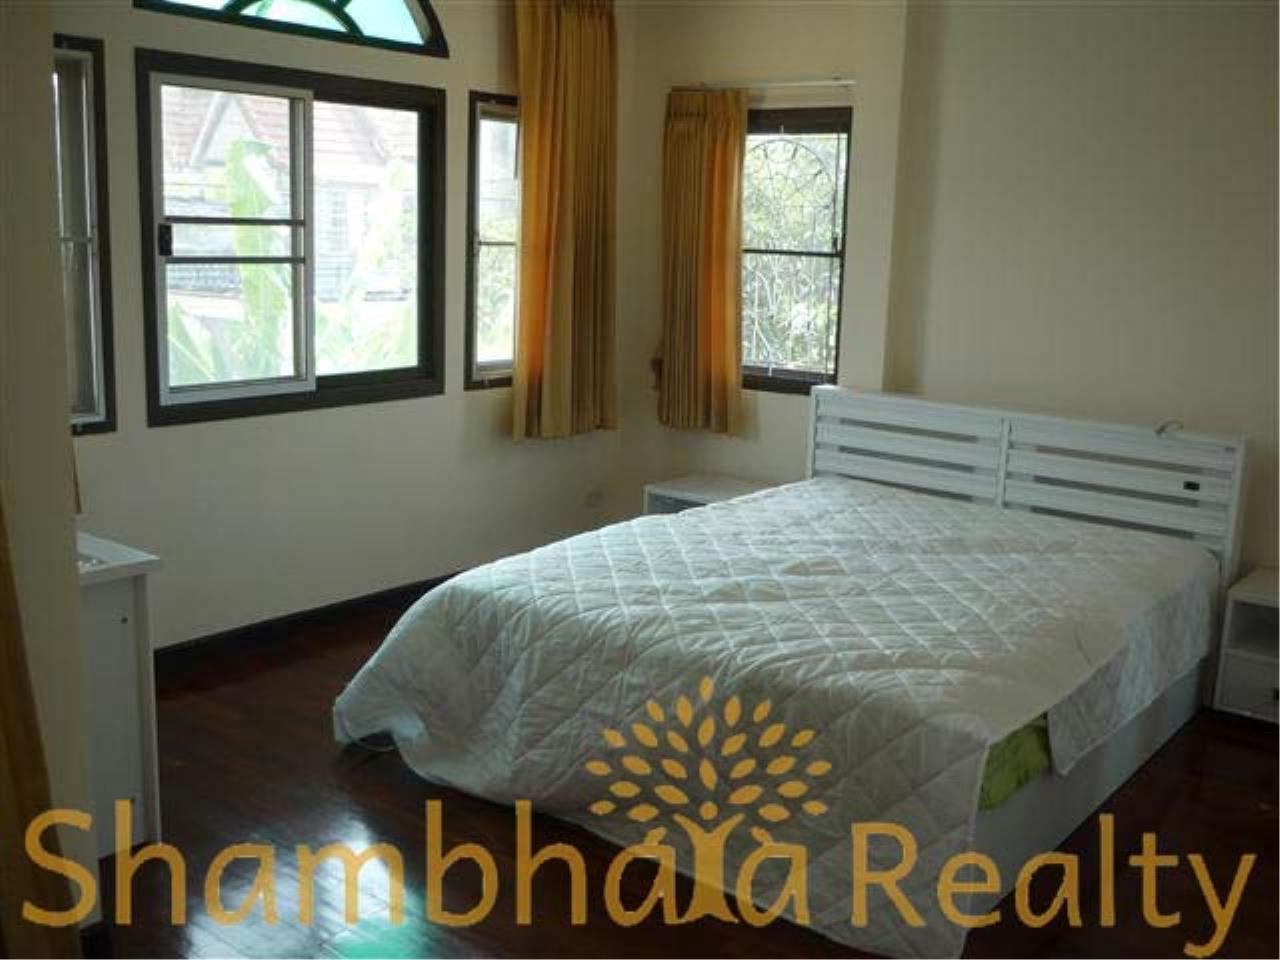 Shambhala Realty Agency's Single house to rent at Lassalle 22 Condominium for Rent in Sukhumvit Soi 101, Lassalle 22 7